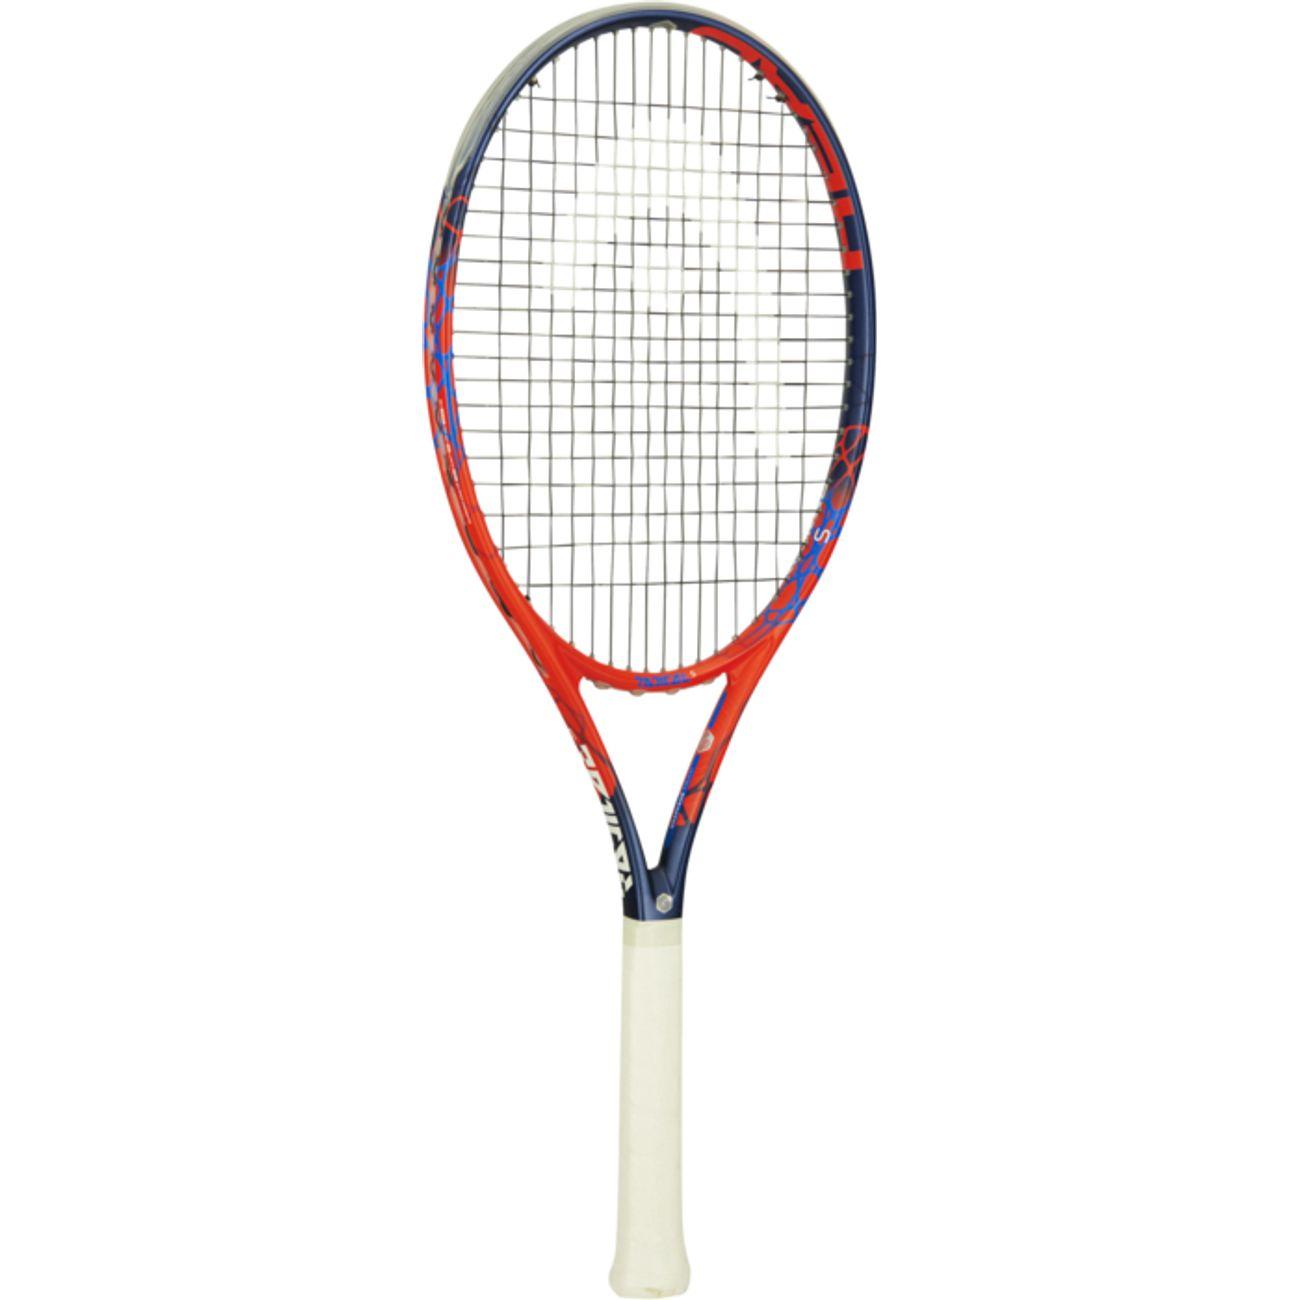 RAQUETTE Tennis adulte HEAD RADICAL S